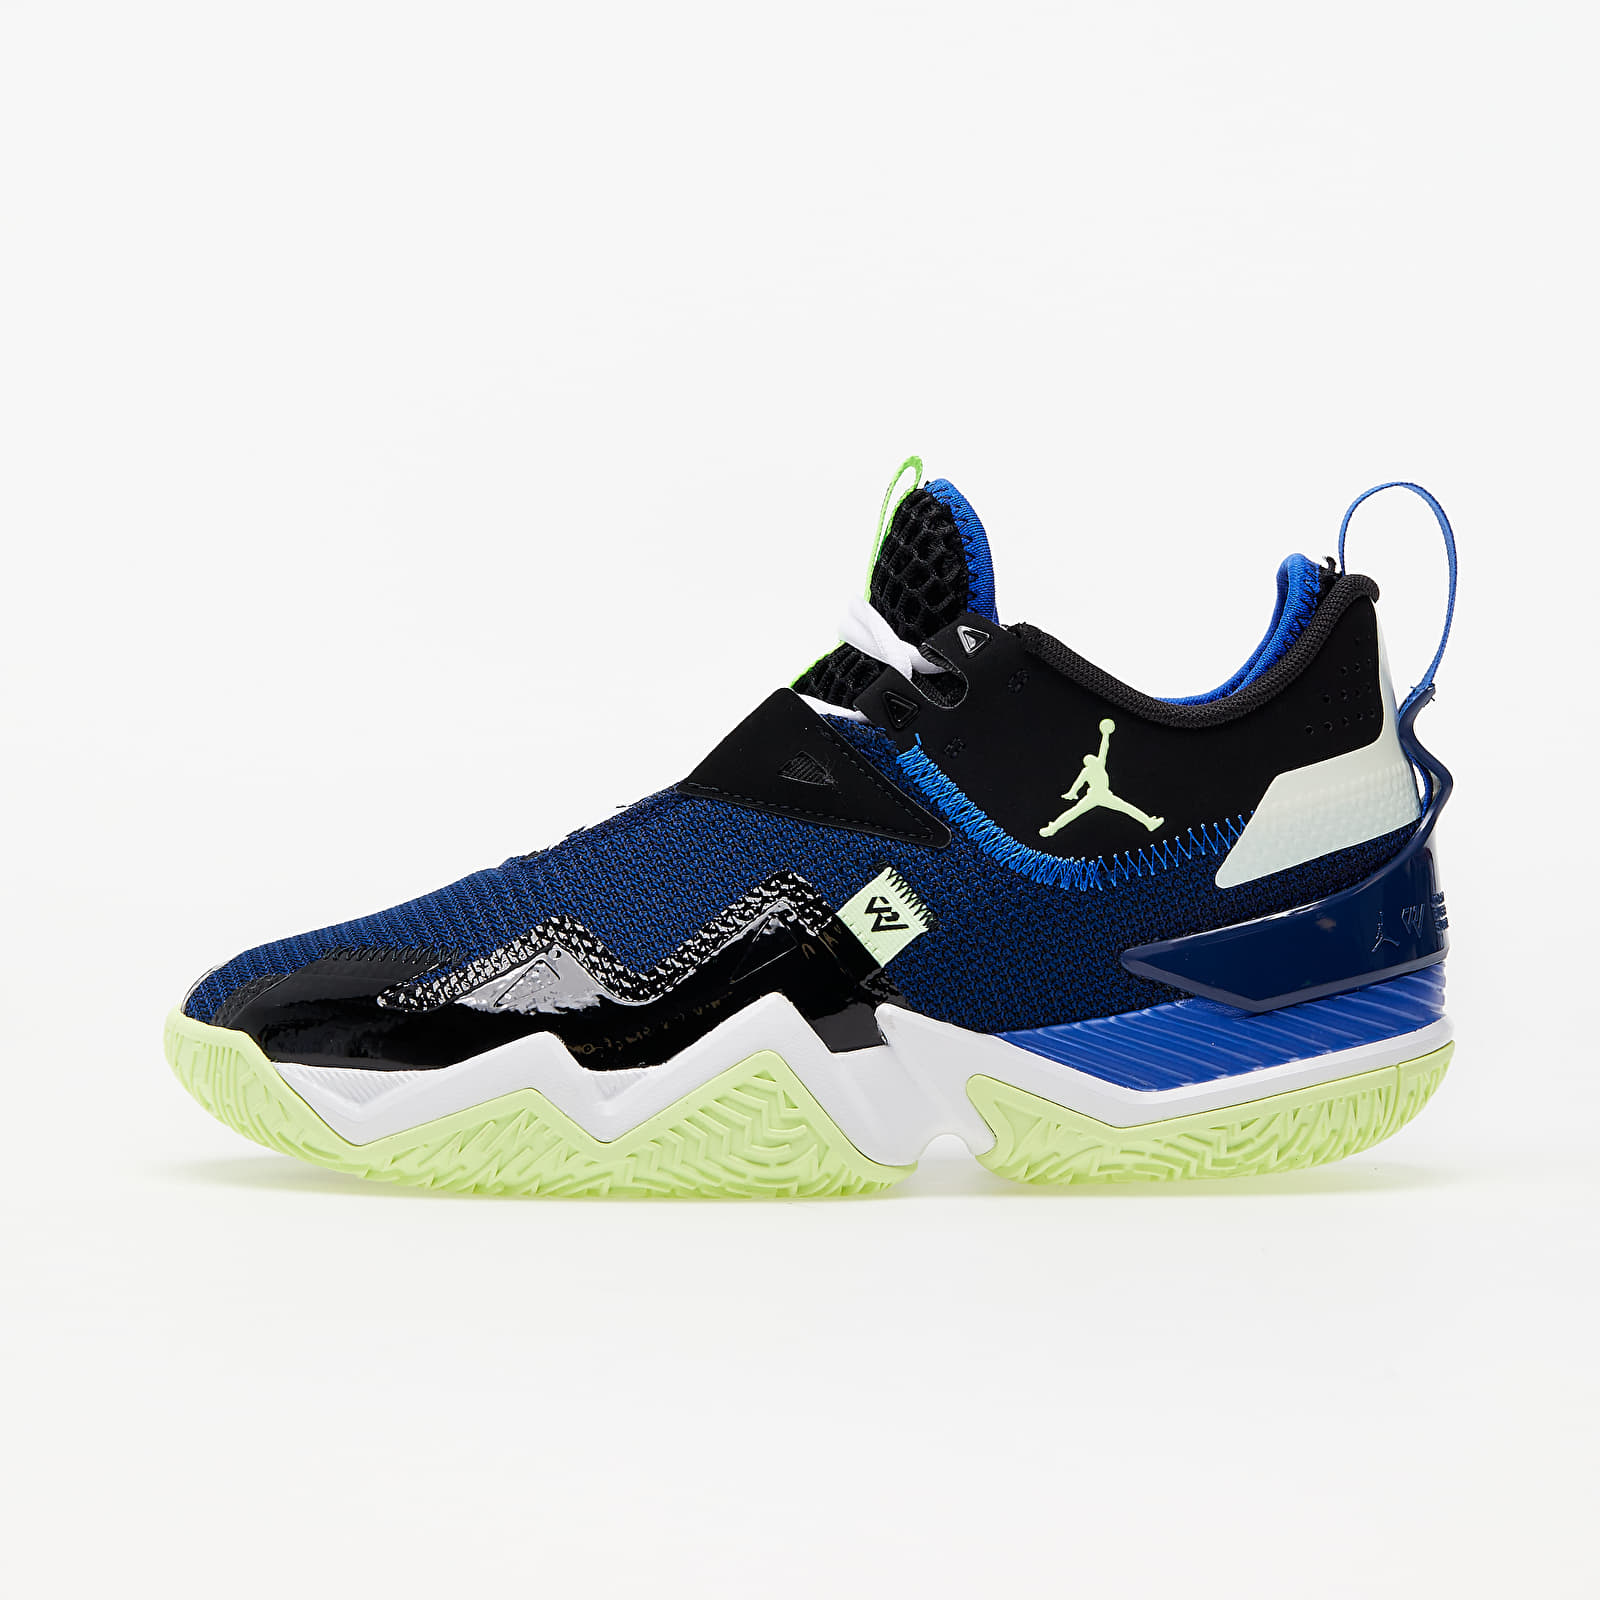 Jordan Westbrook One Take Black/ Barely Volt-Hyper Royal-Blue Void CJ0780-004